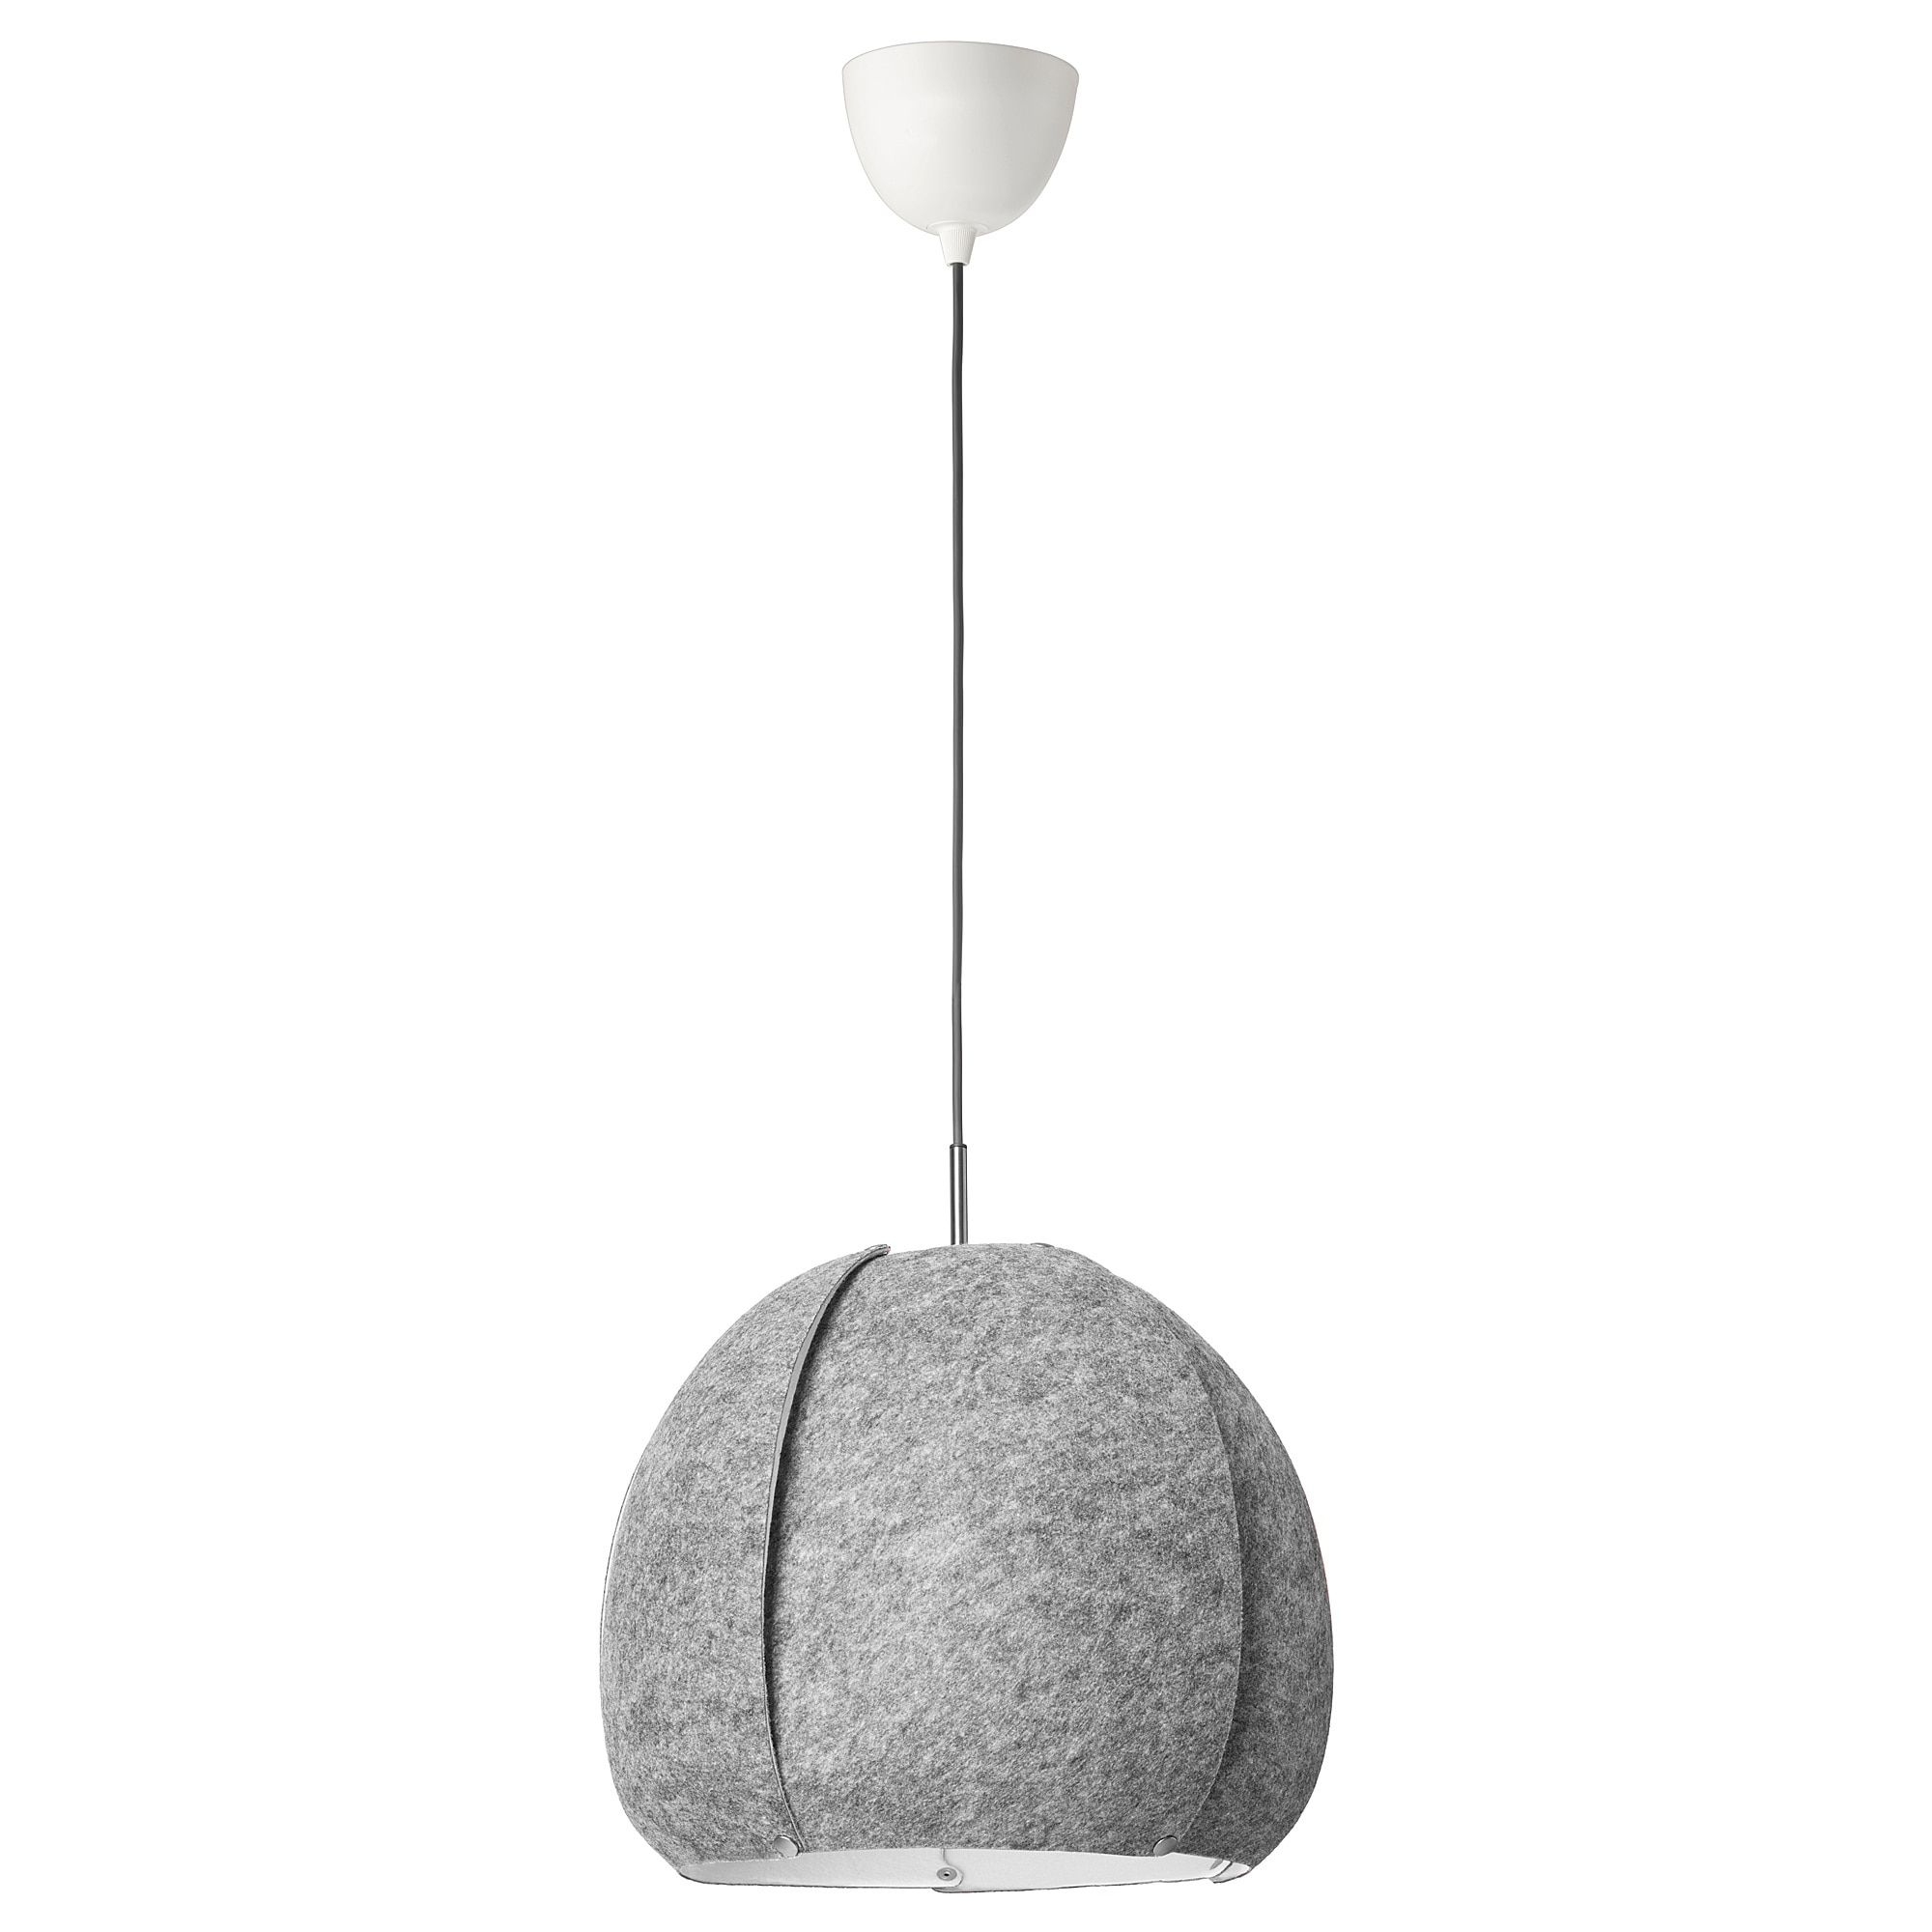 Vintergata Pendant Lamp Ikea Pendant Lamp Lamp Ceiling Lamp